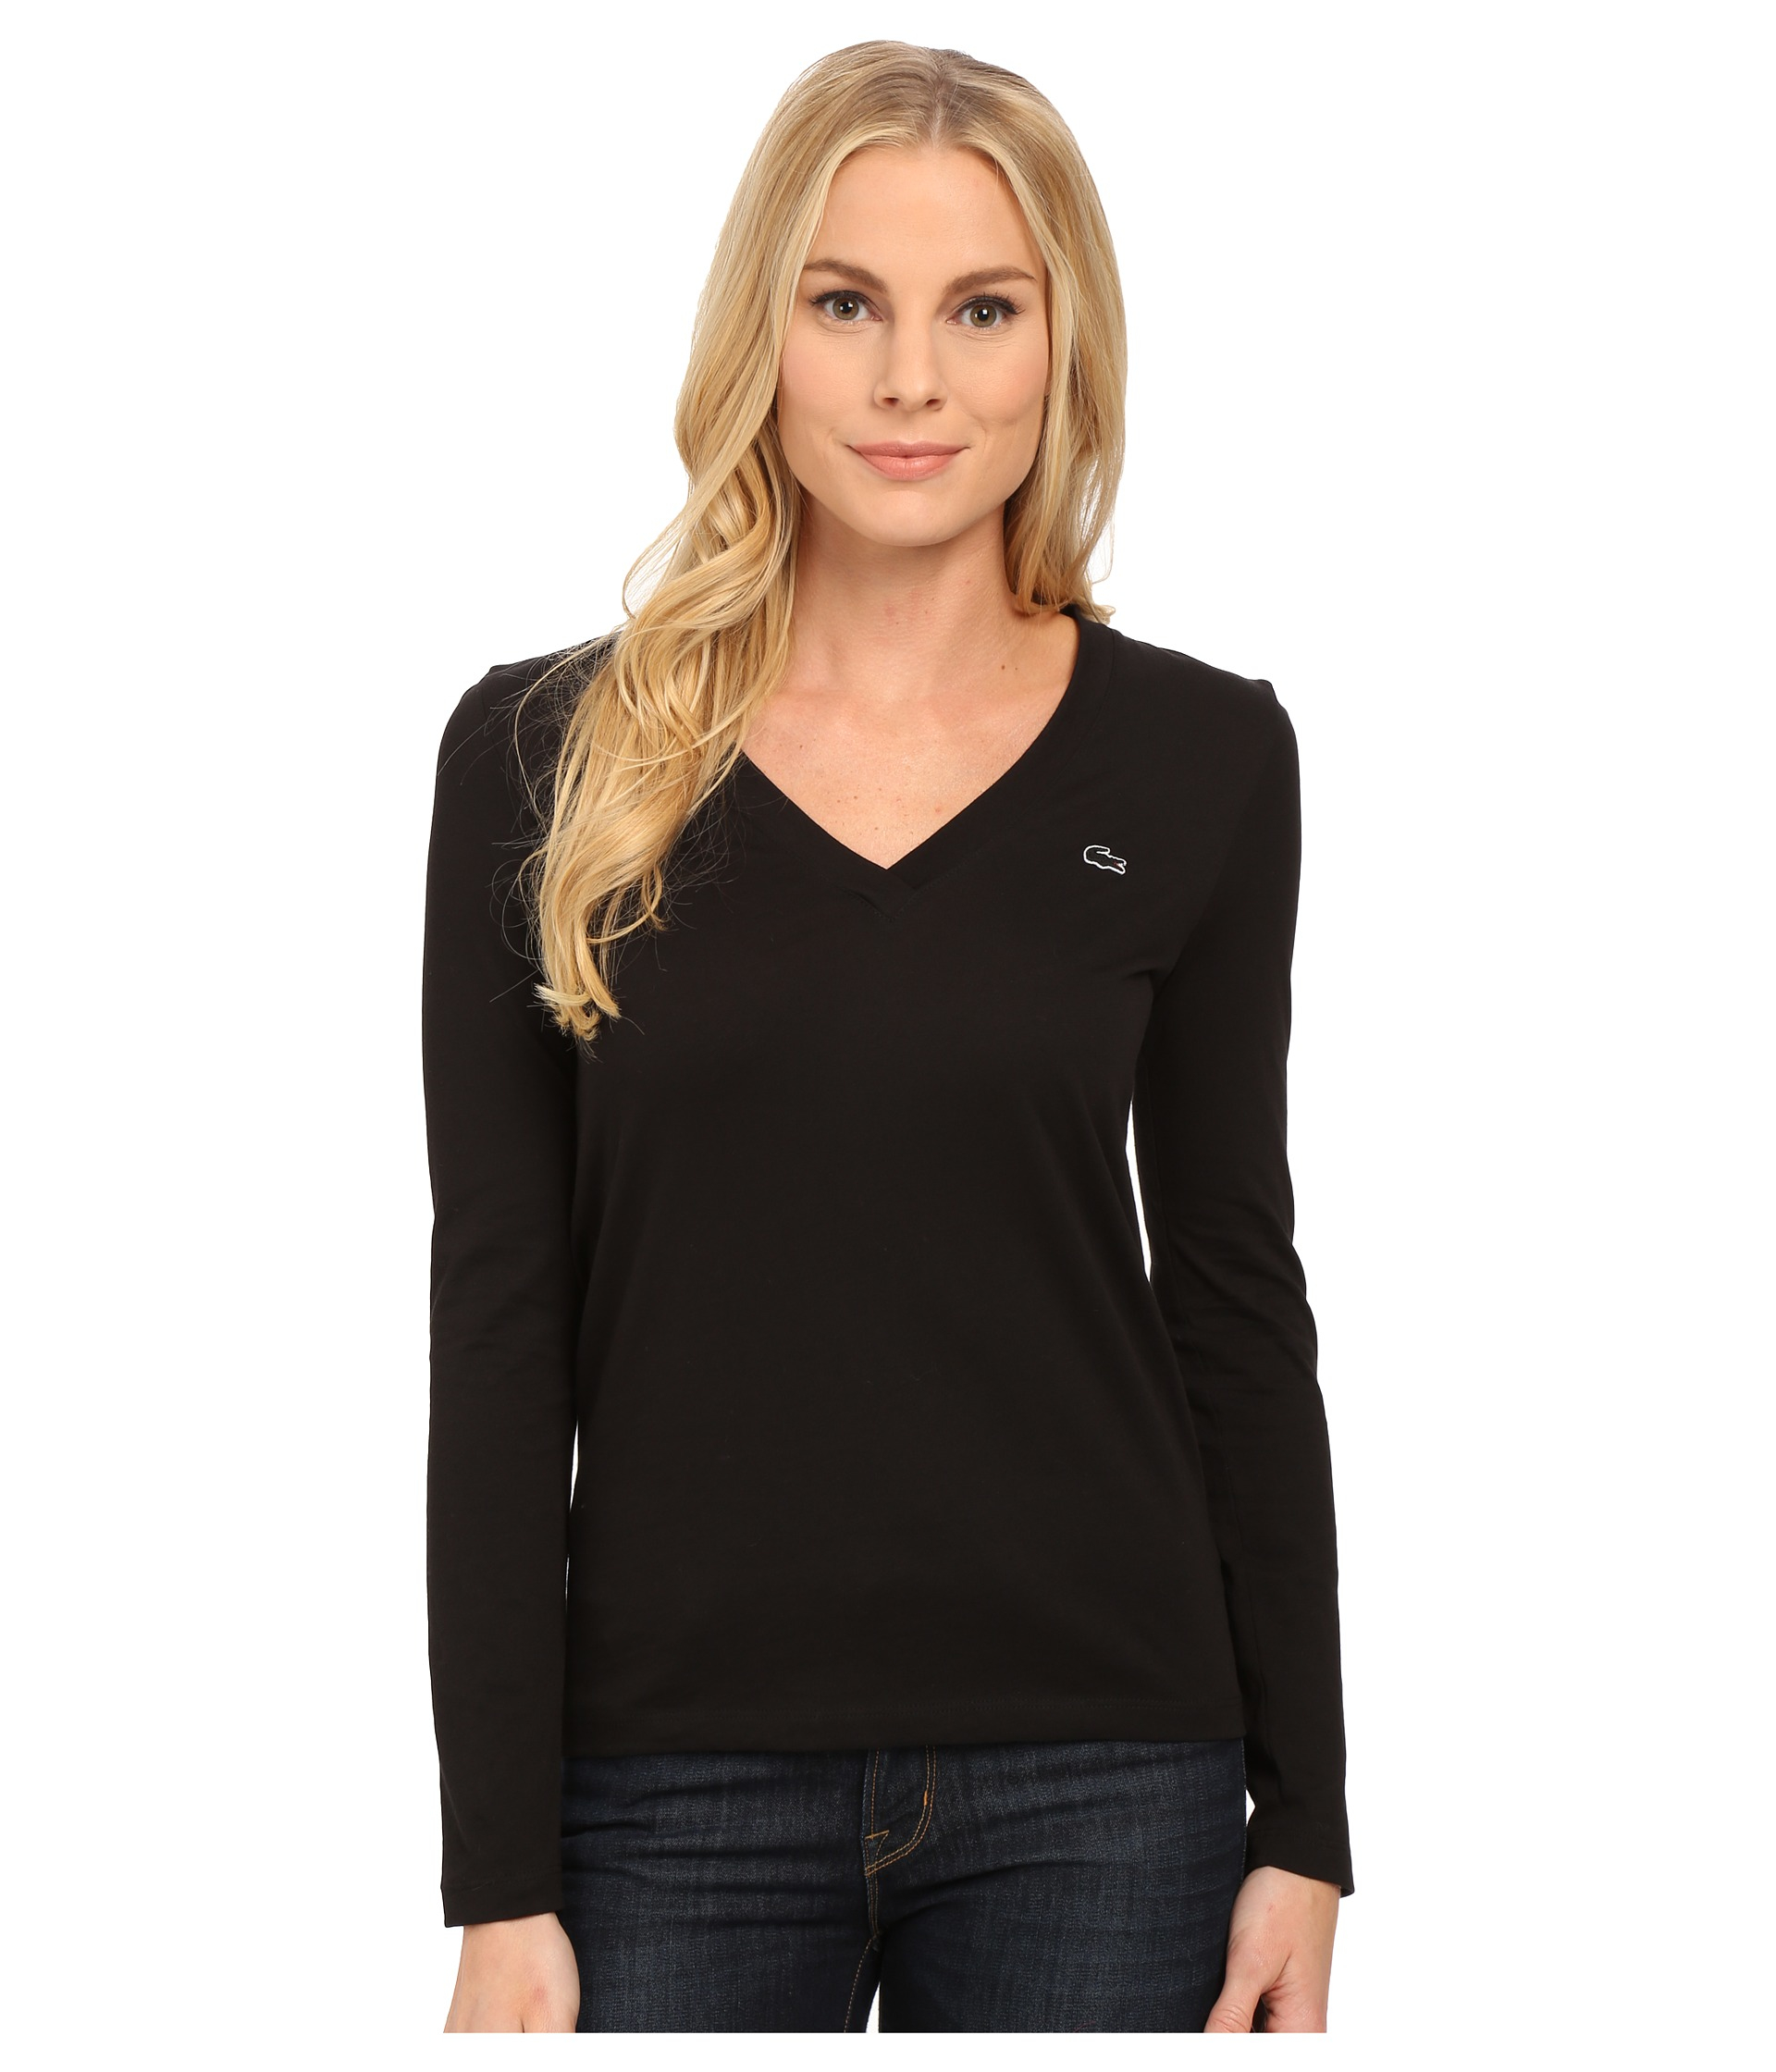 e2ddcdd3ba8e Lacoste Long Sleeve Cotton Jersey V-neck Tee Shirt in Black - Lyst